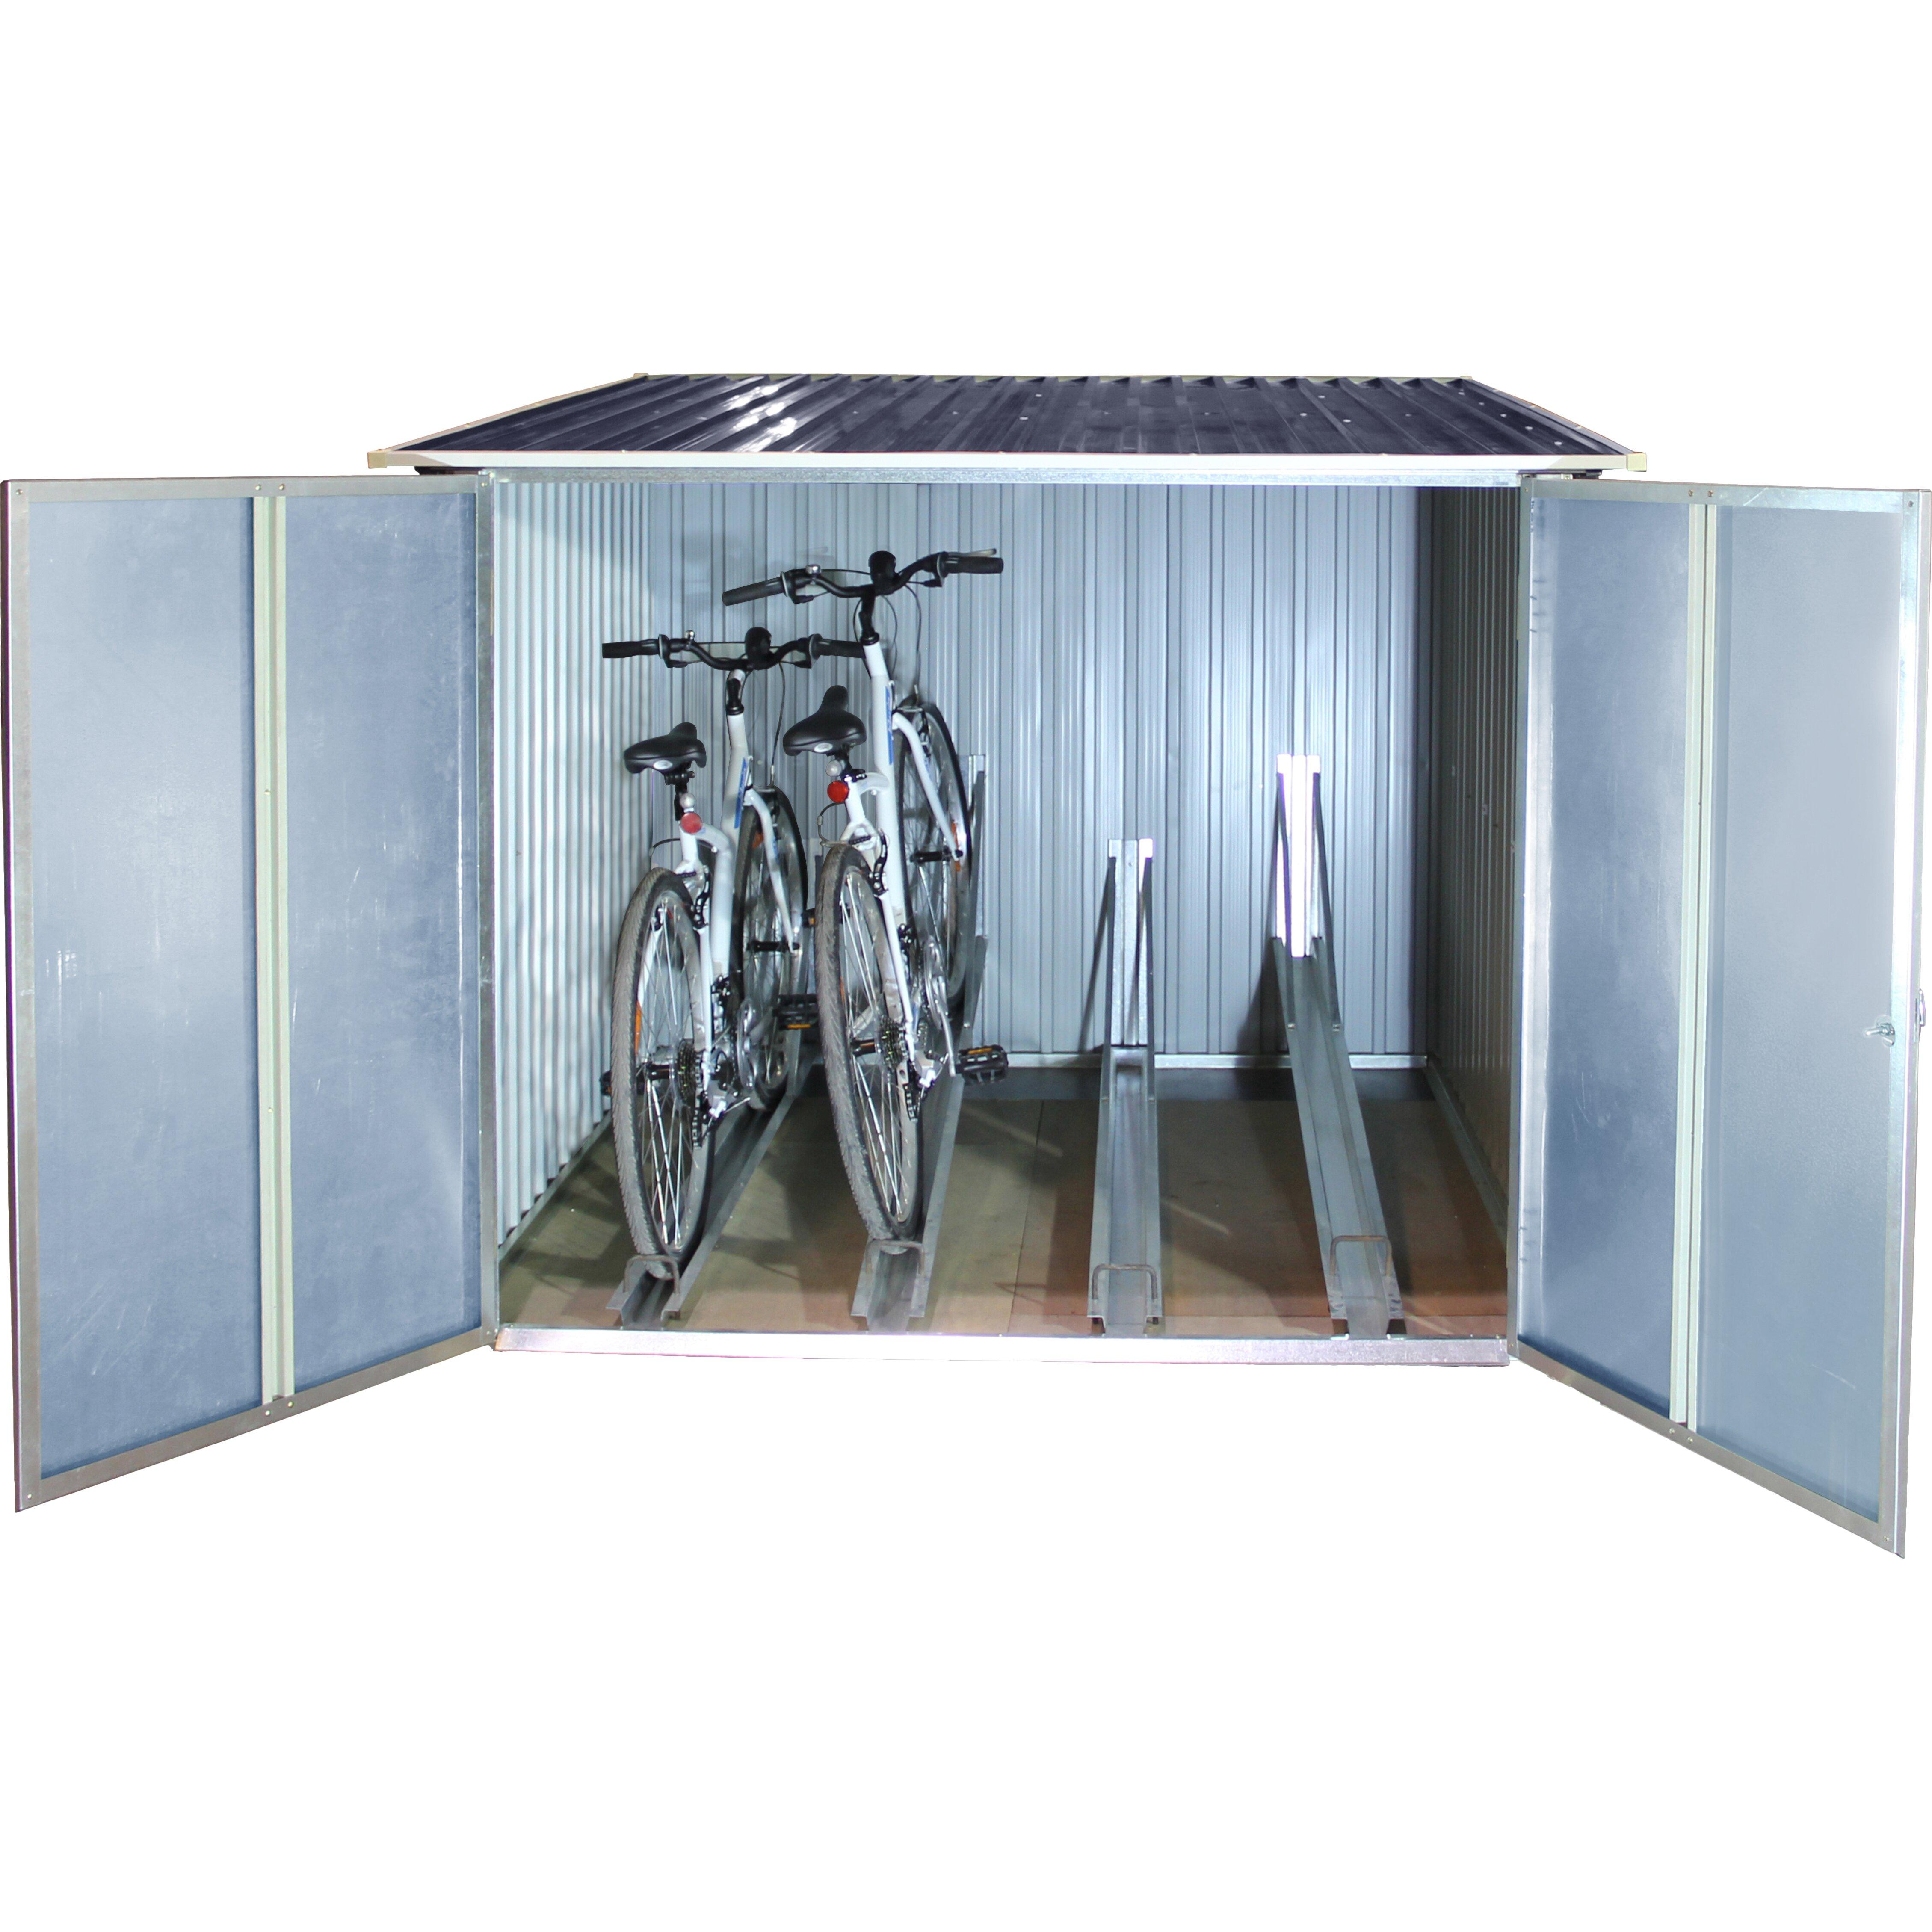 tepro 262 cm x 183 cm fahrradgarage aus metall reviews von manufacturer. Black Bedroom Furniture Sets. Home Design Ideas